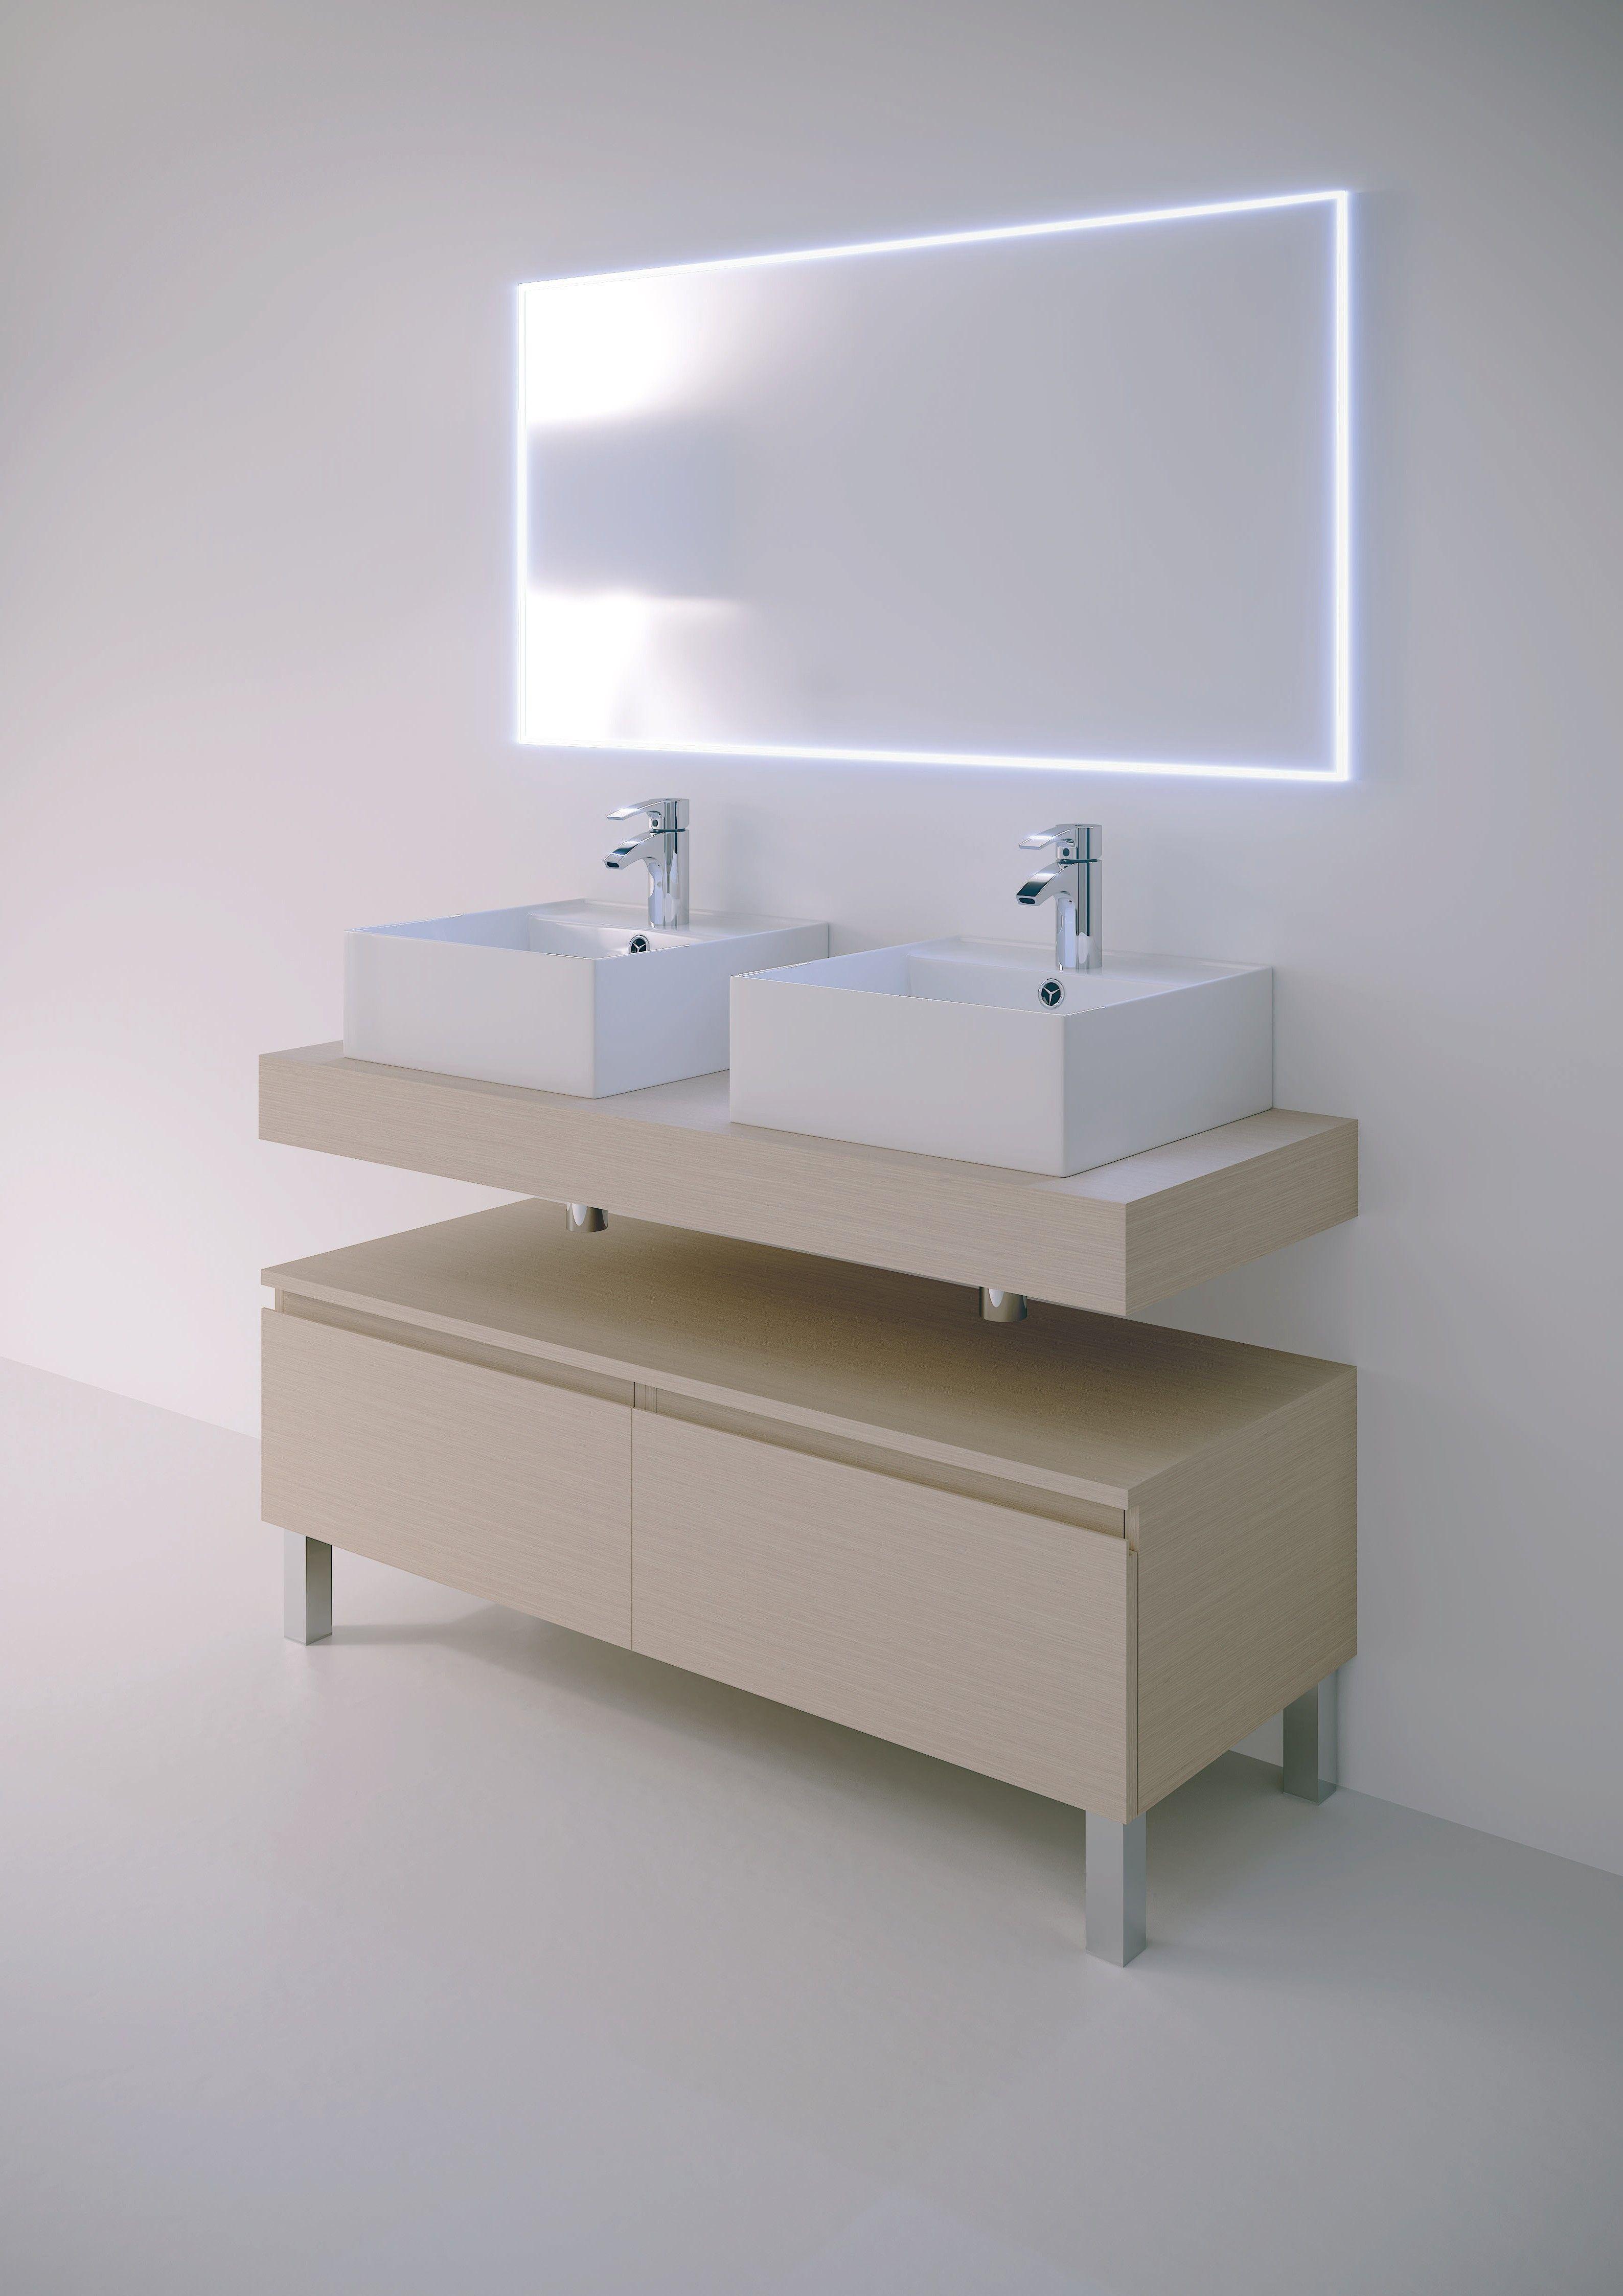 Muebles Bajo Lavabo Serie Ele Muebles Bajo Lavabo Muebles Auxiliares Baño Muebles